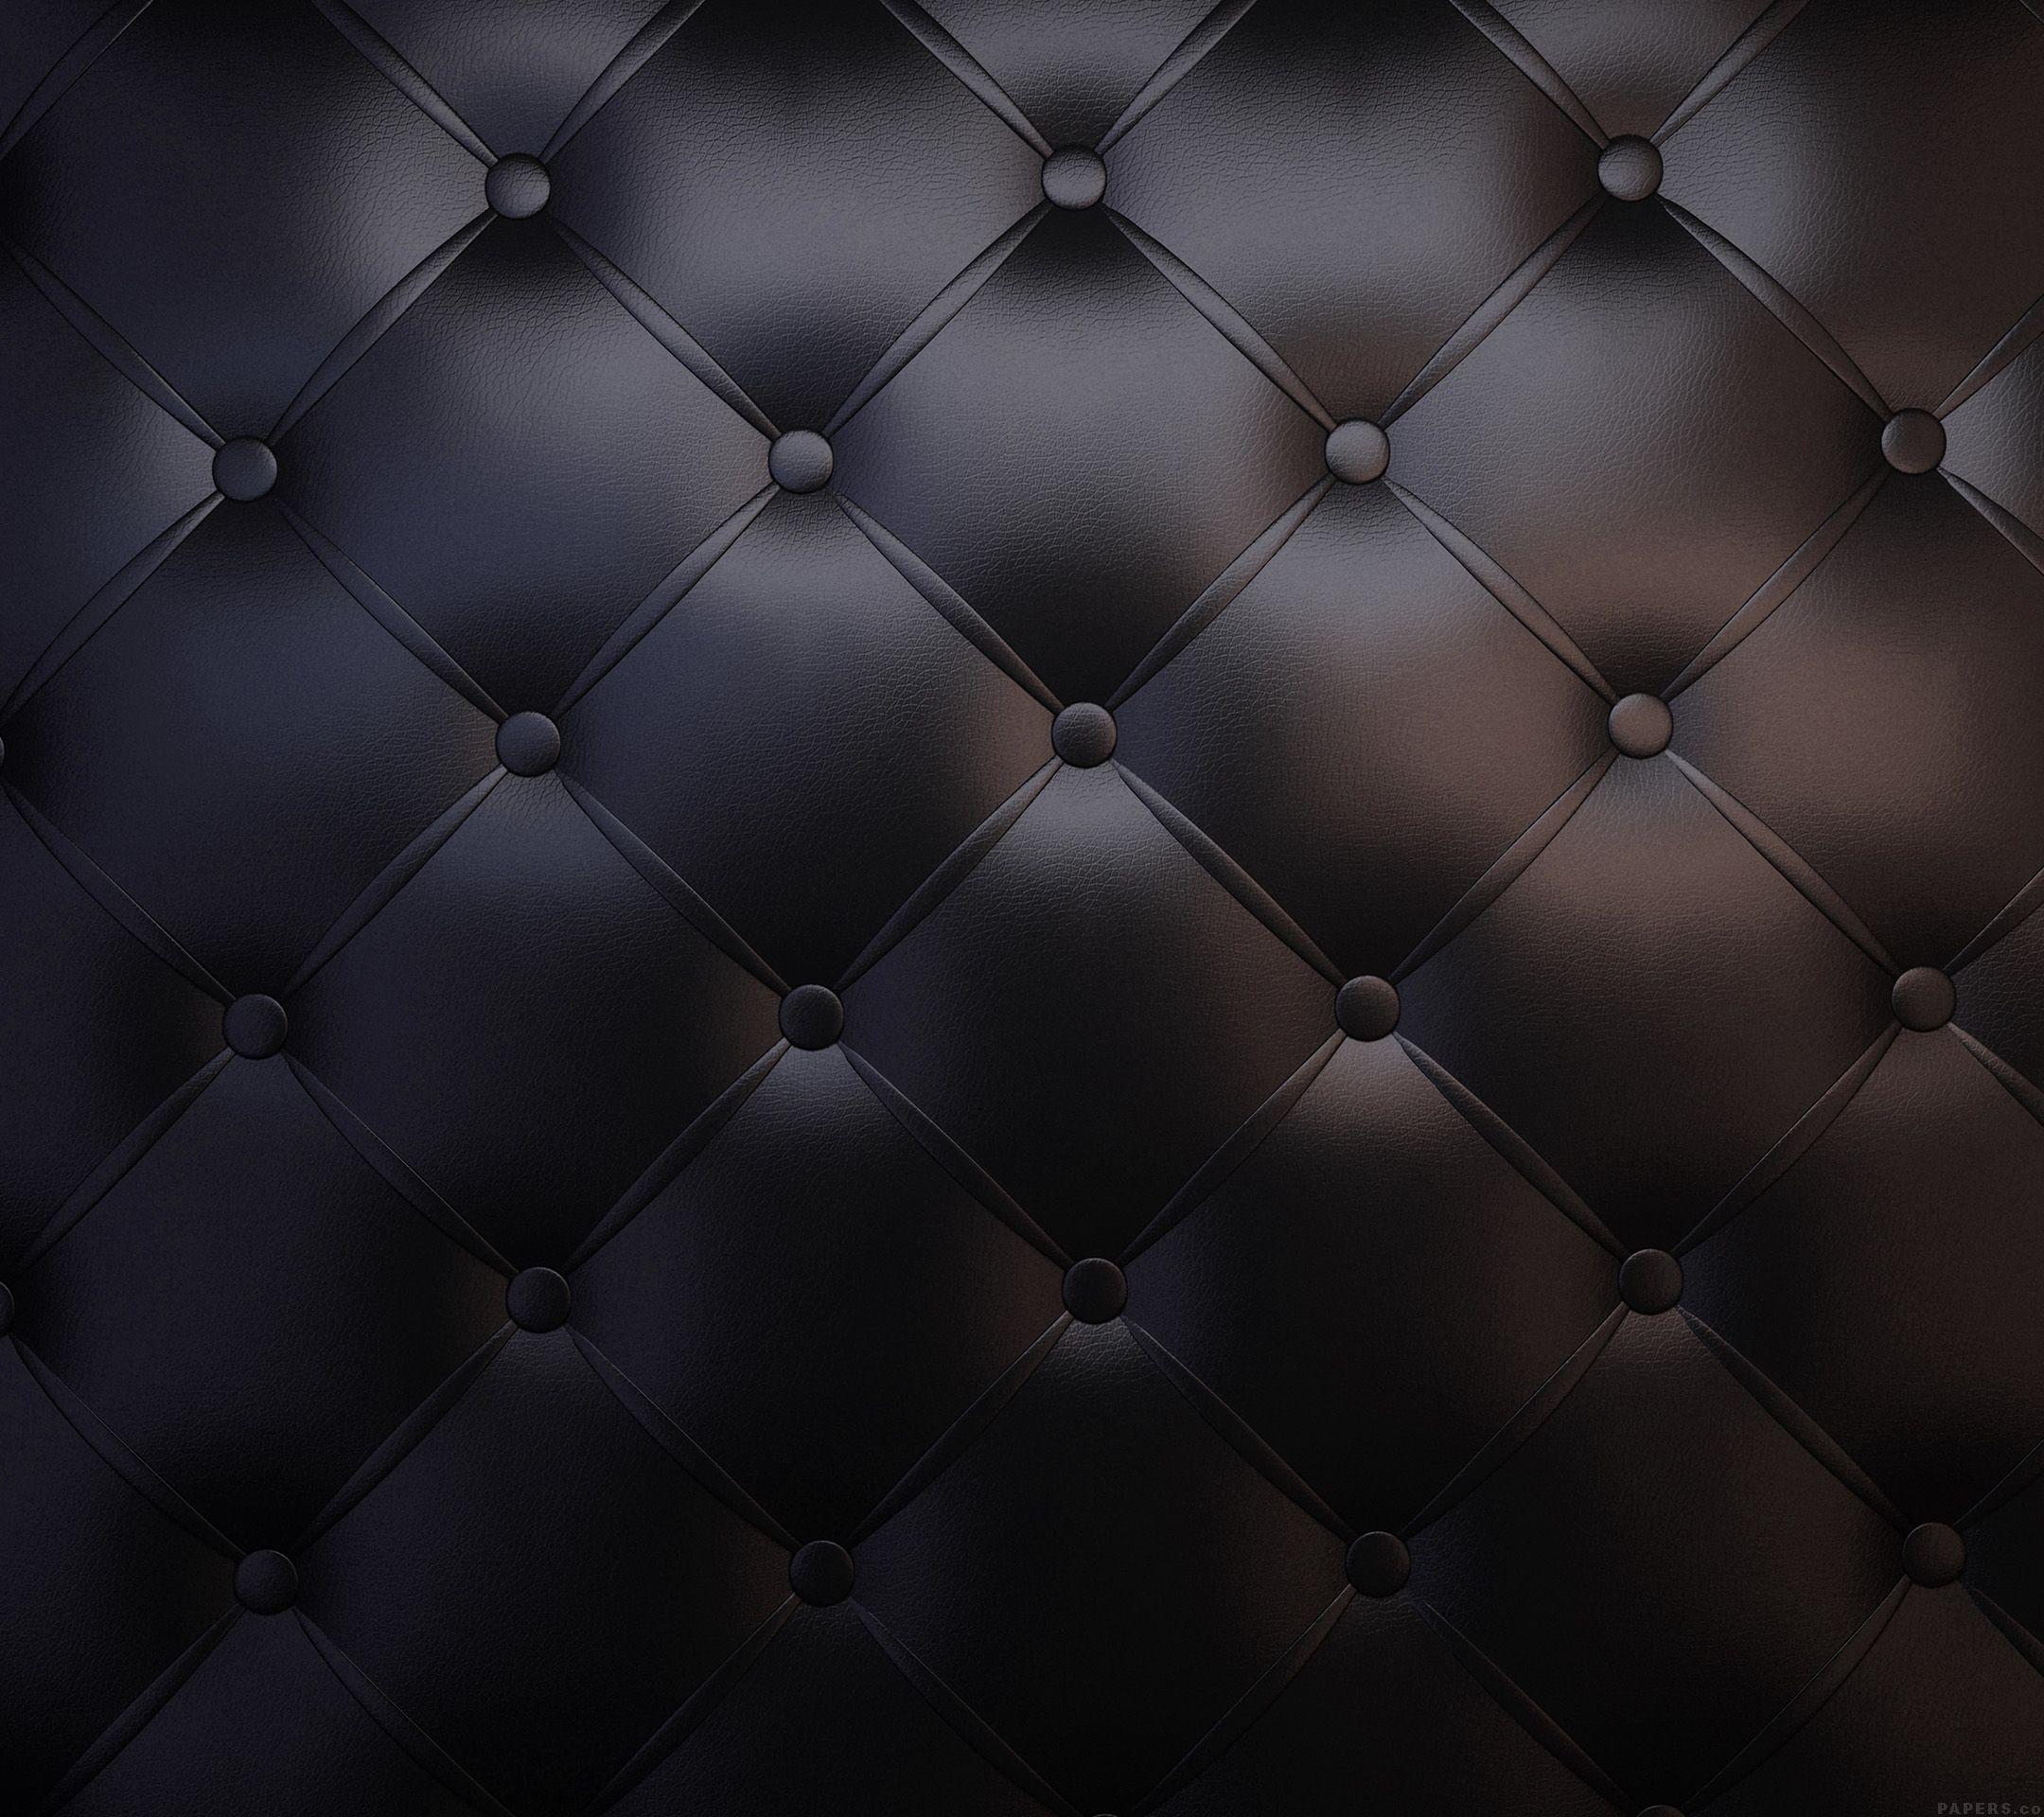 vf49sofareddarktexturepattern Classy wallpaper